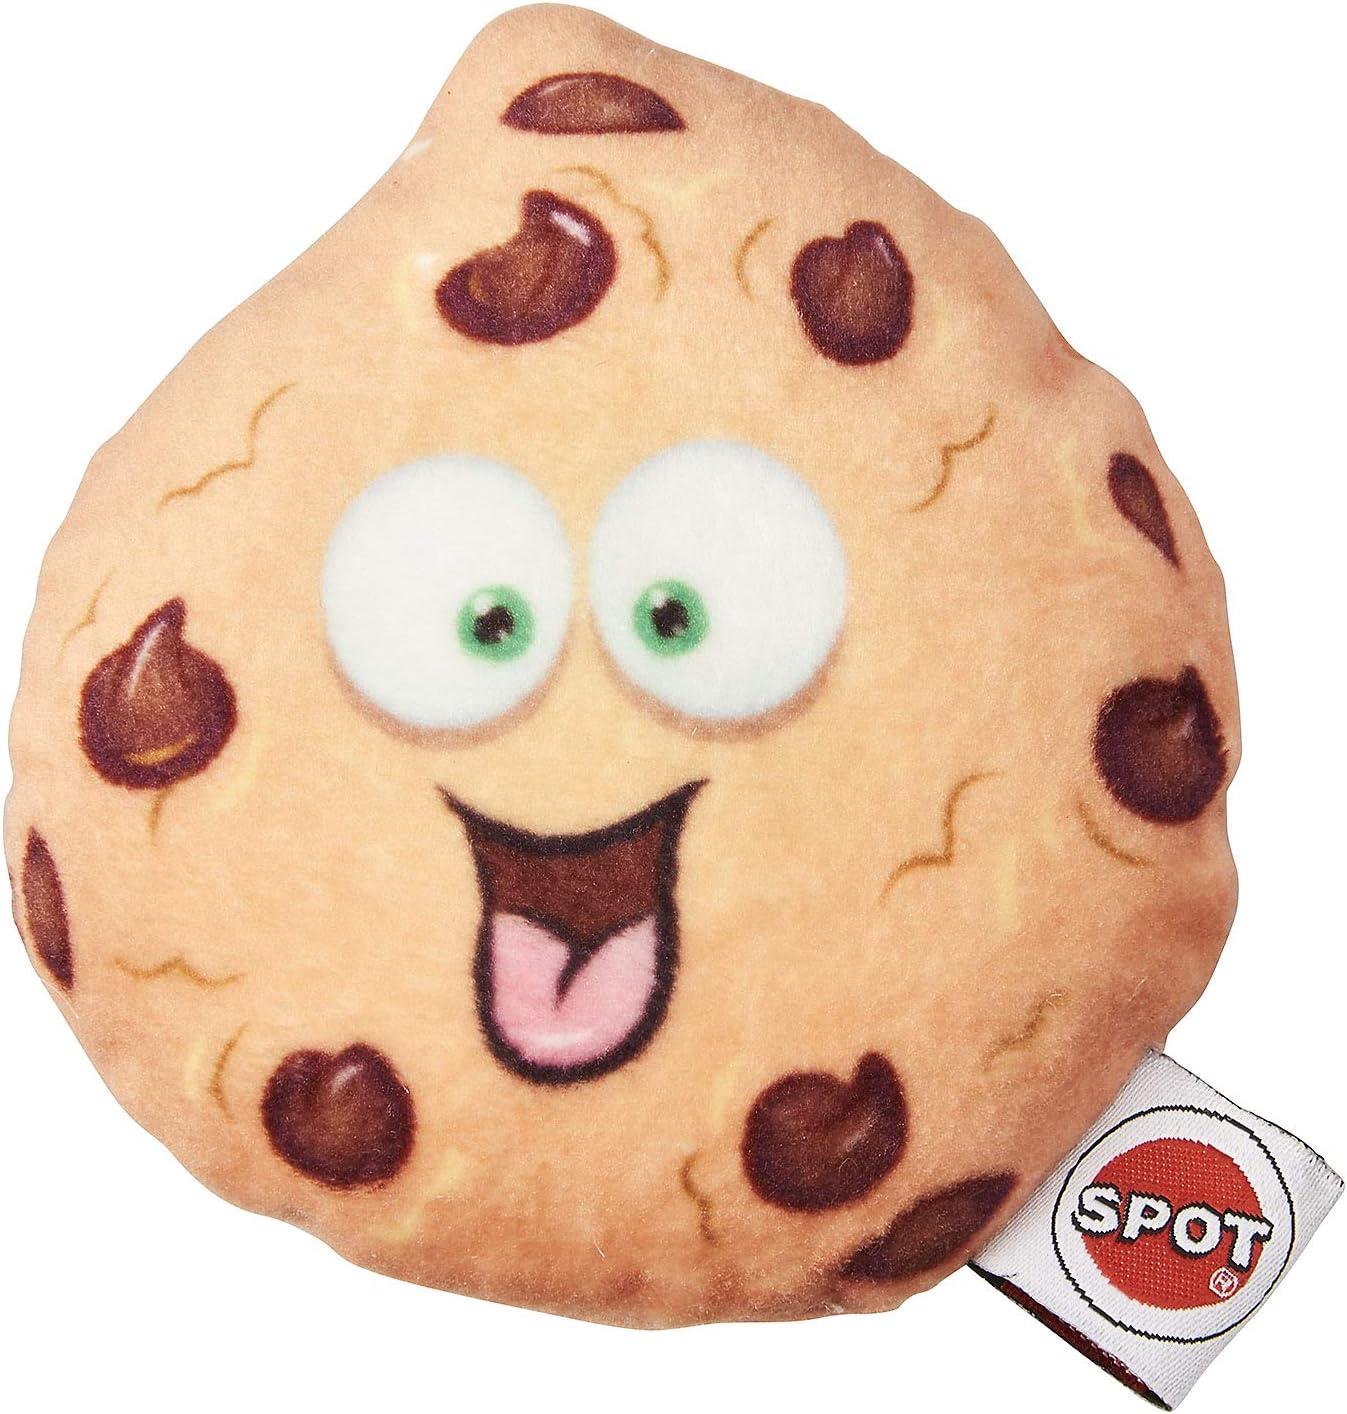 SPOT Fun Food Chocolate Chip Cookie 4